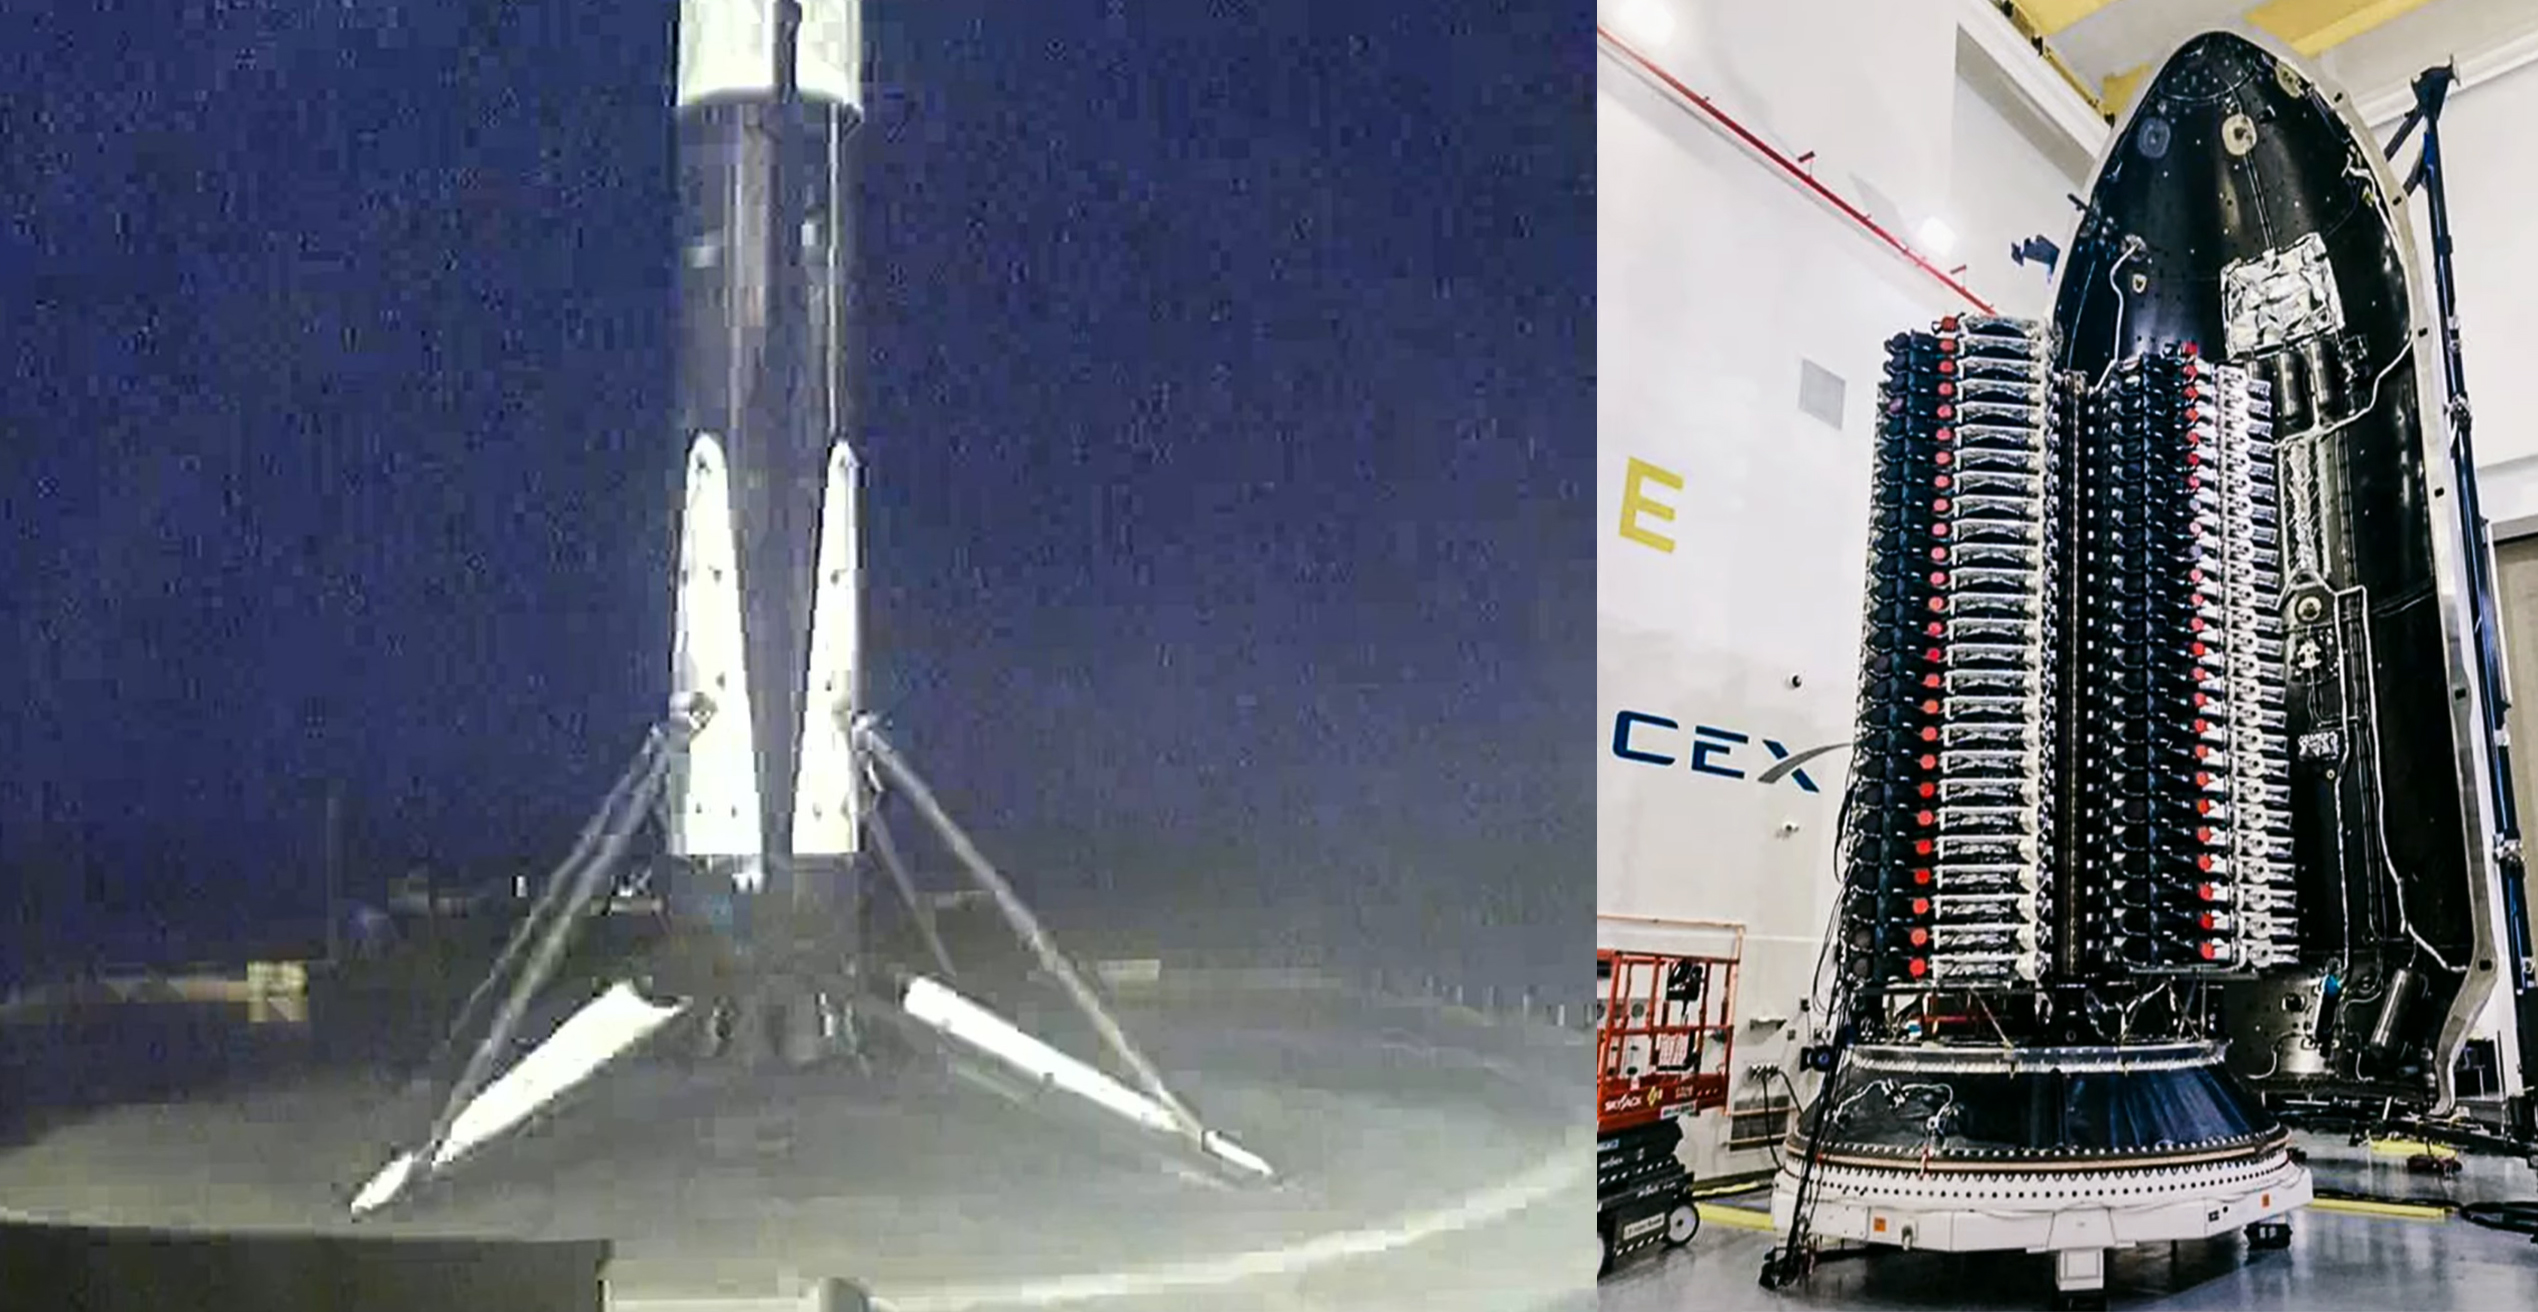 Starlink 2-1 V1.5 F9 B1049 091321 webcast (SpaceX) OCISLY landing + stack 1